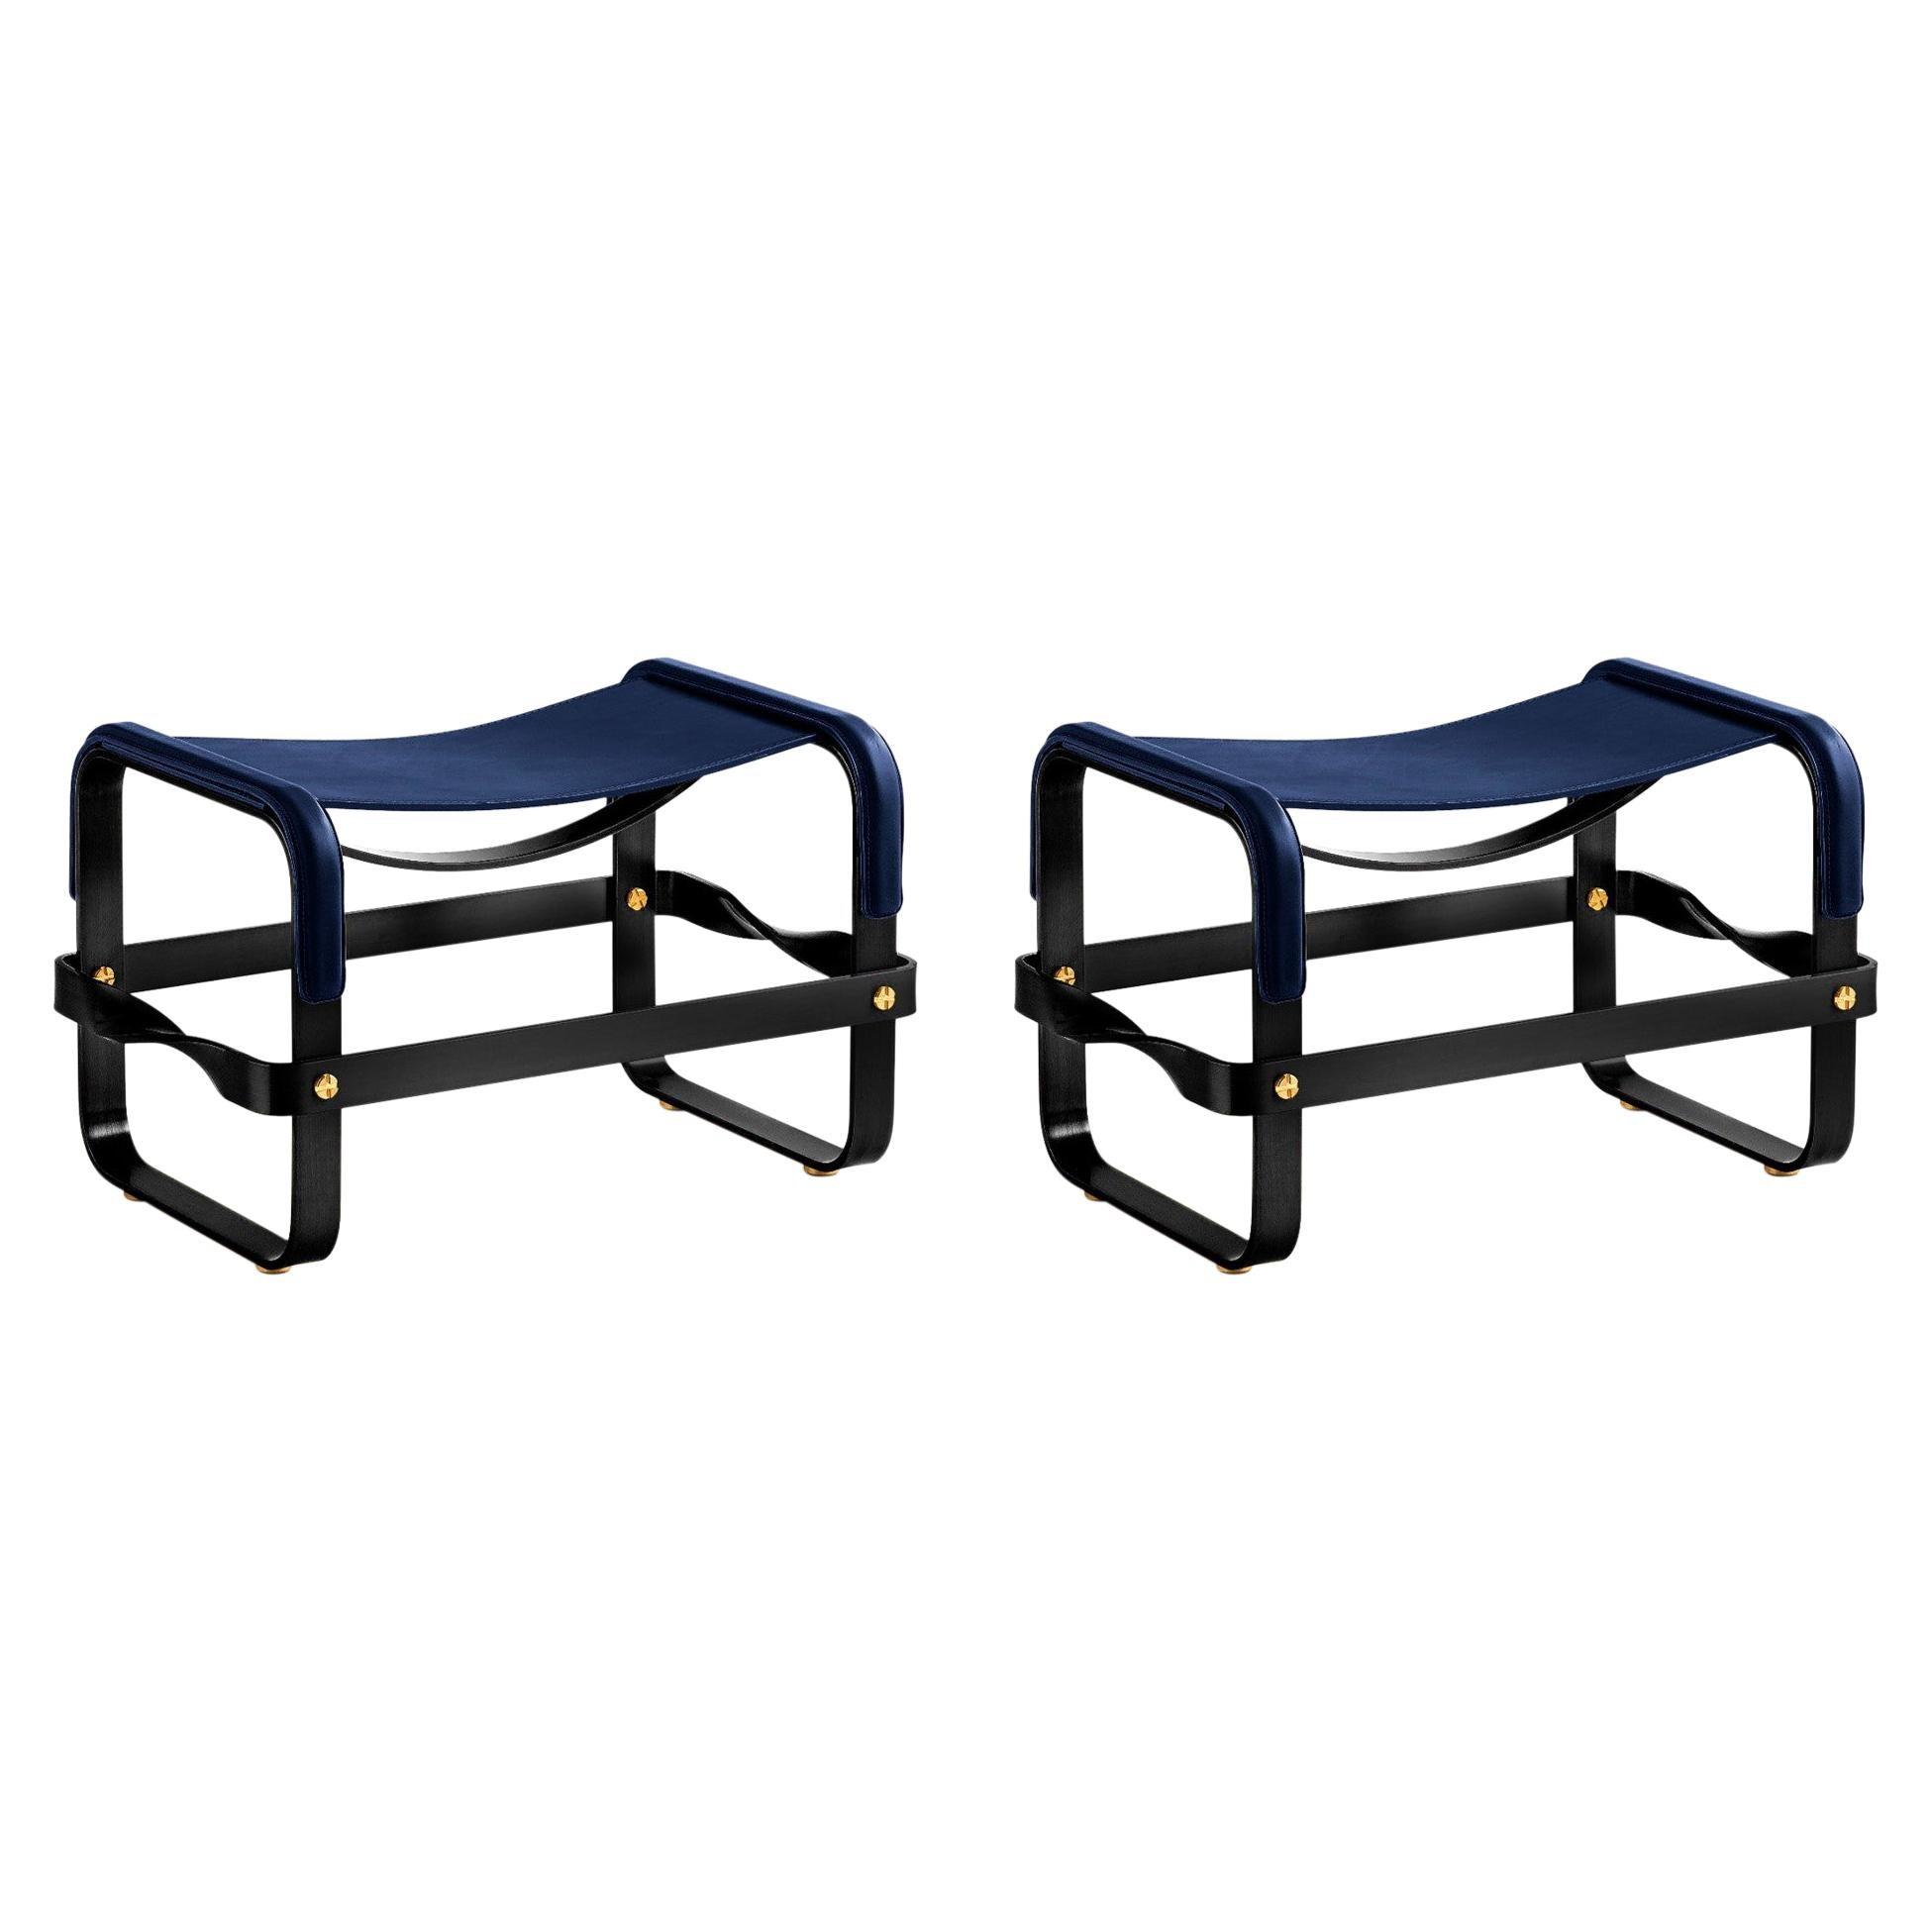 Set of 2 Footstool Black Smoke Steel & Navy Blue Leather, Modern Style